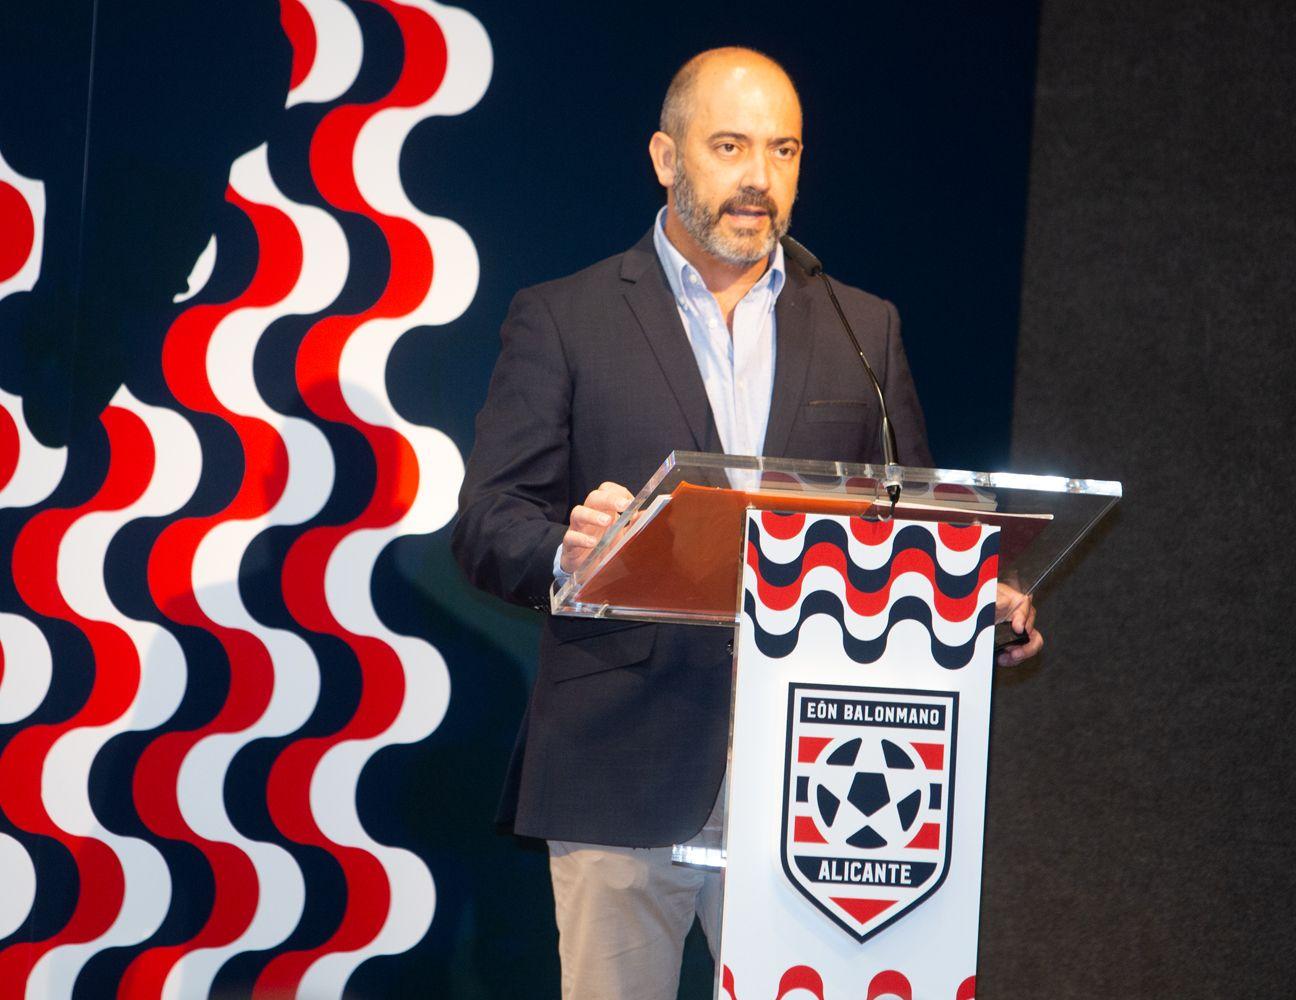 Presentación Eon Balonmano Alicante